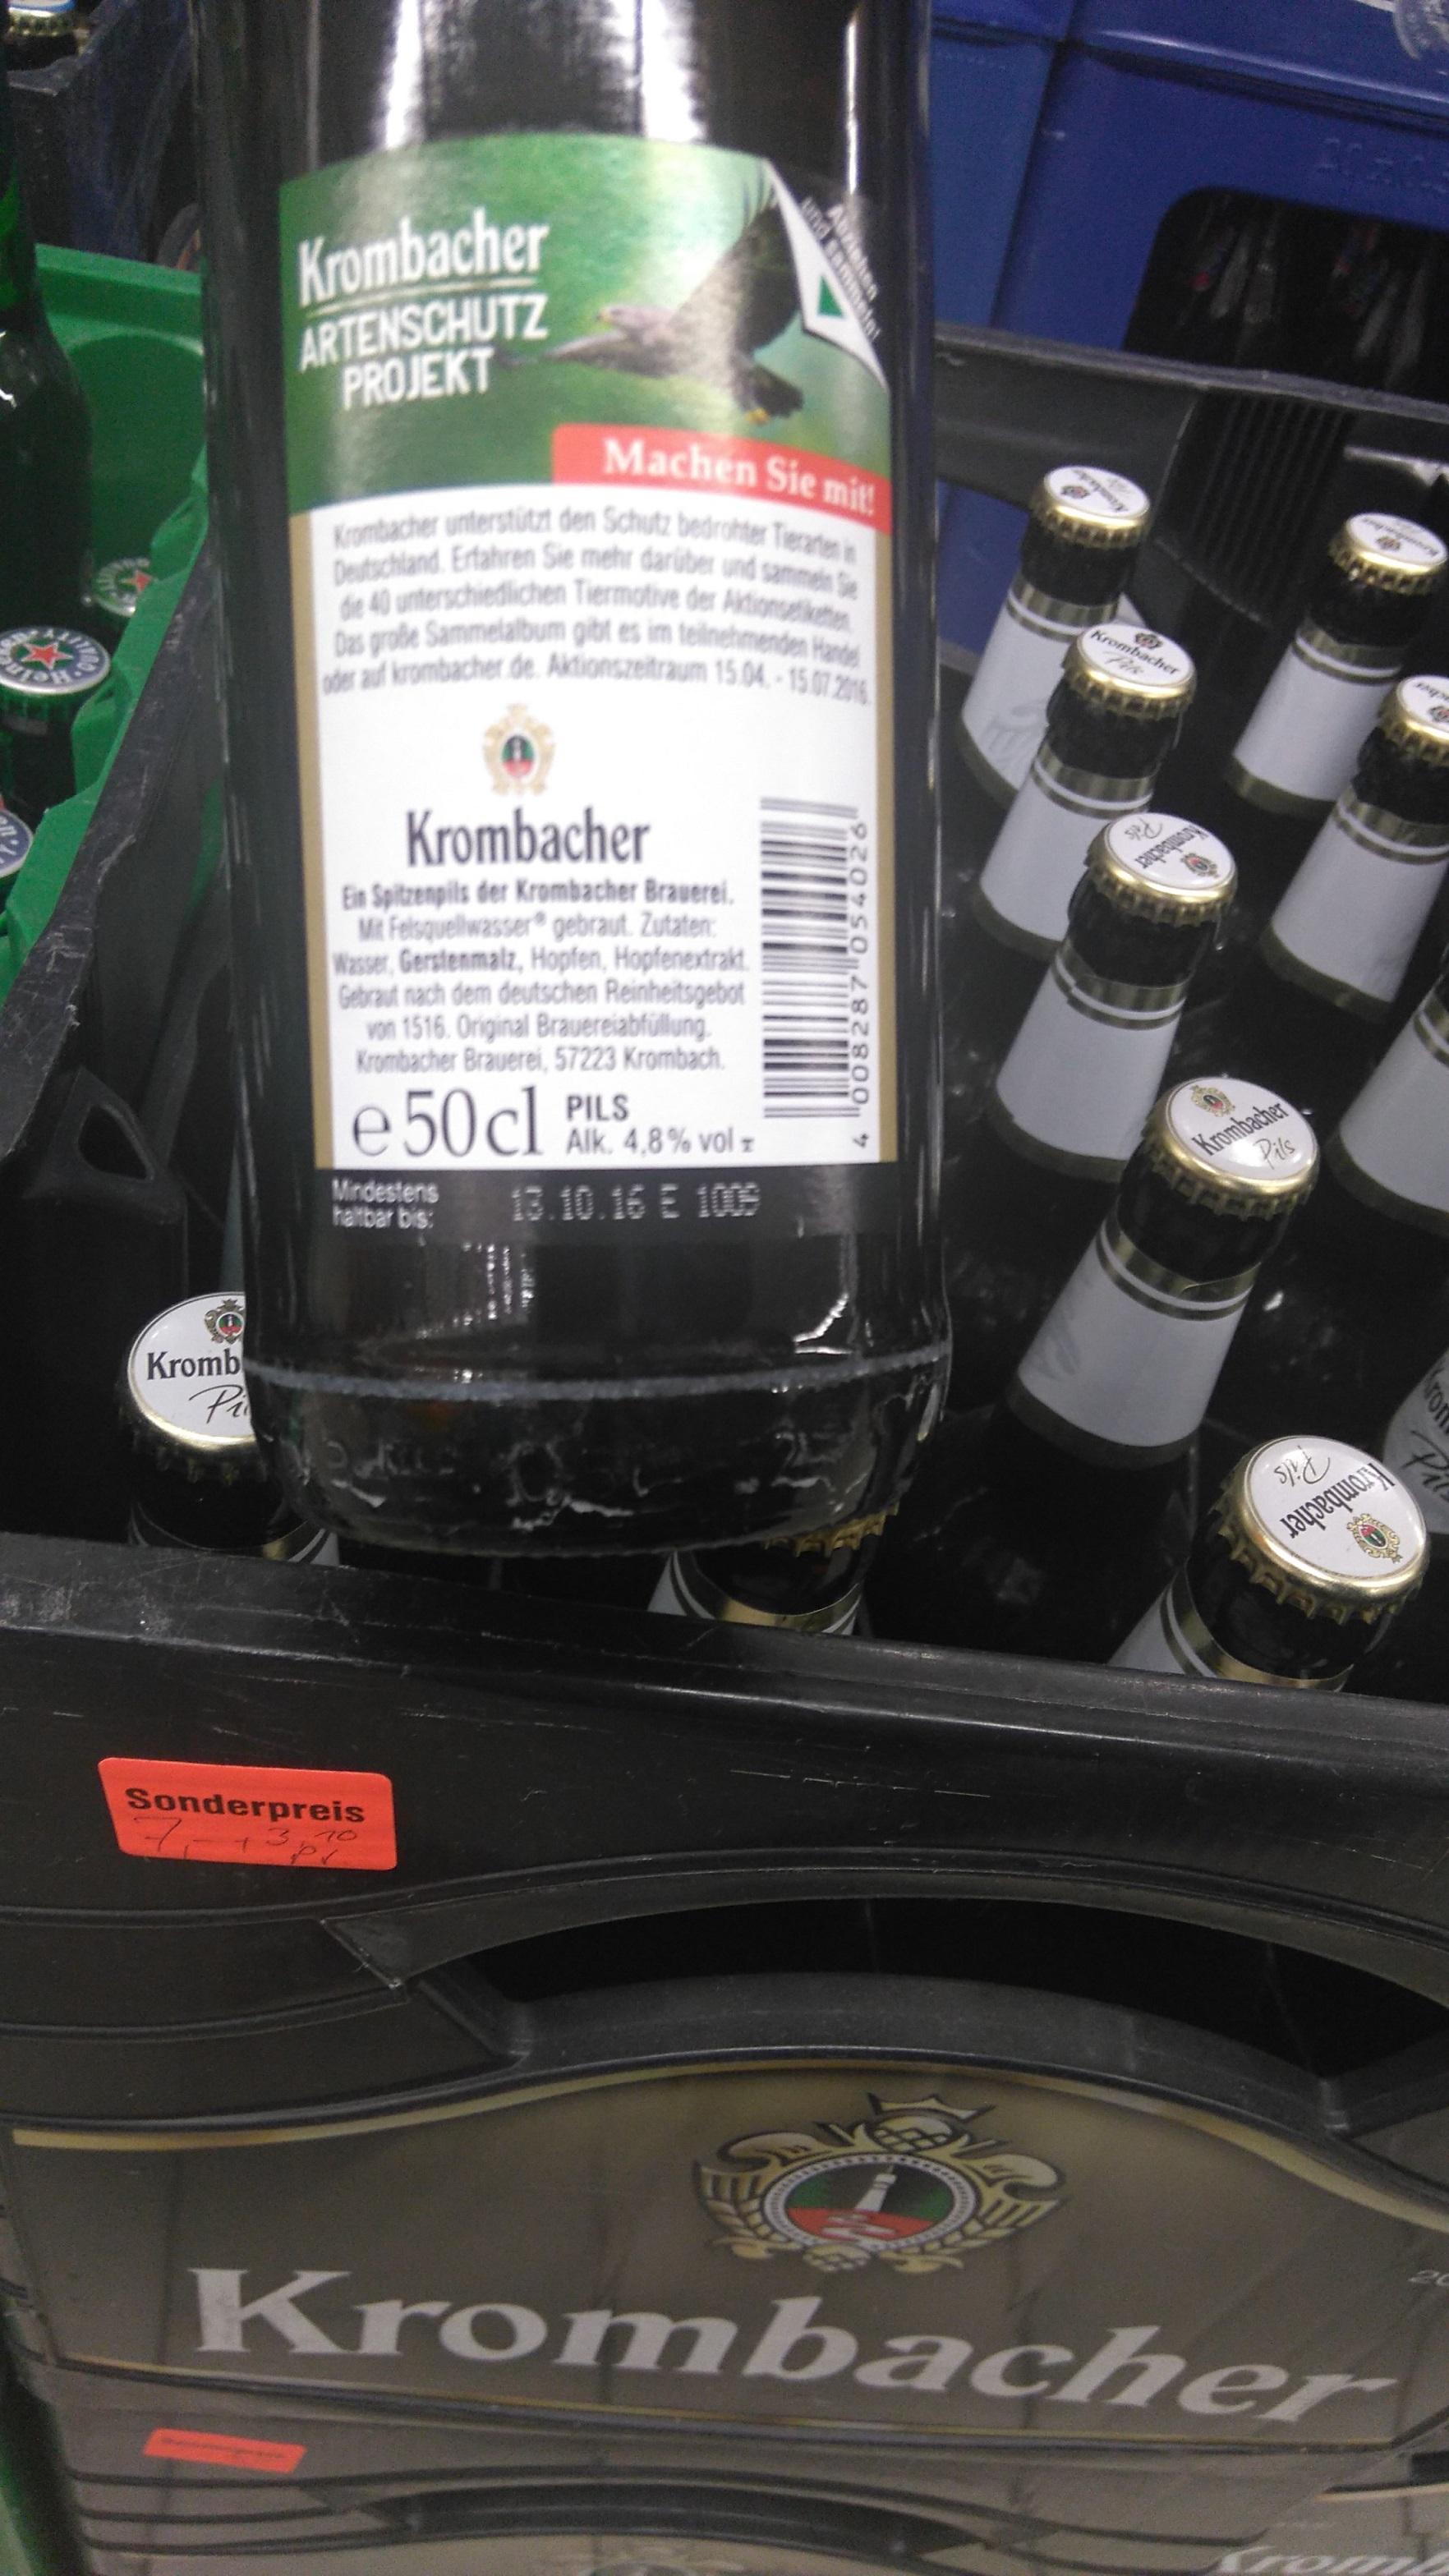 [Lokal REWE Beilngries] Krombacher Pils Kiste 20x0,5l für 7 € + 3,10 € Pfand, MHD 13.10.2016